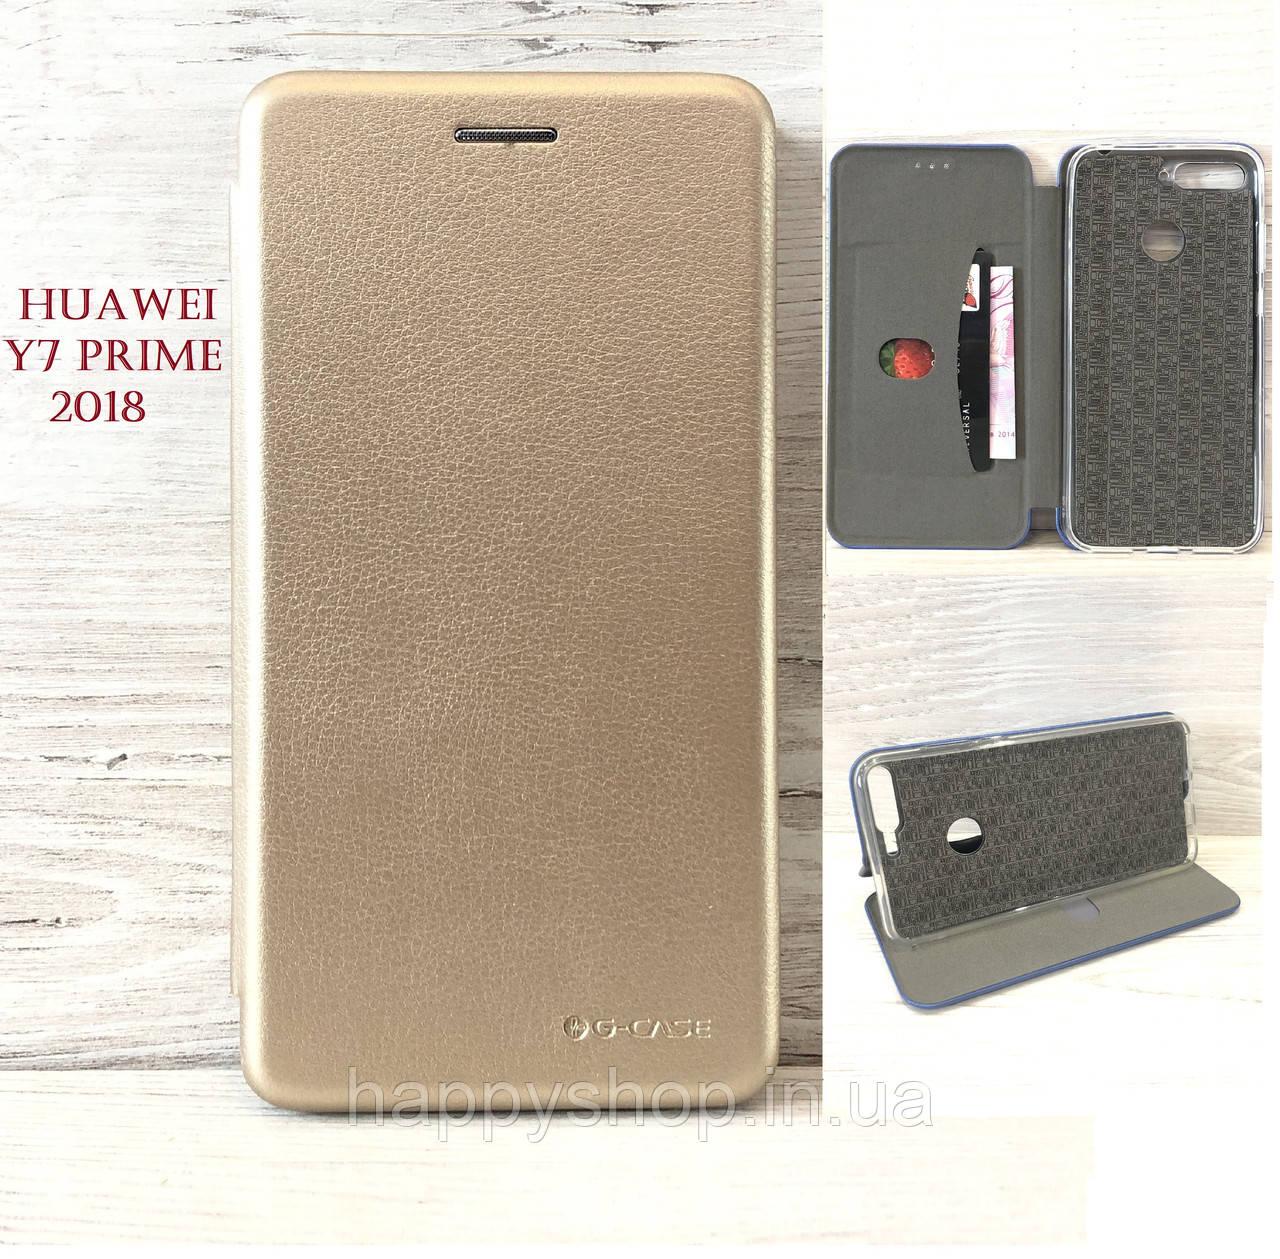 Чехол-книжка G-Case для Huawei  Y7 Prime 2018 (LDN-L21) Золотистый